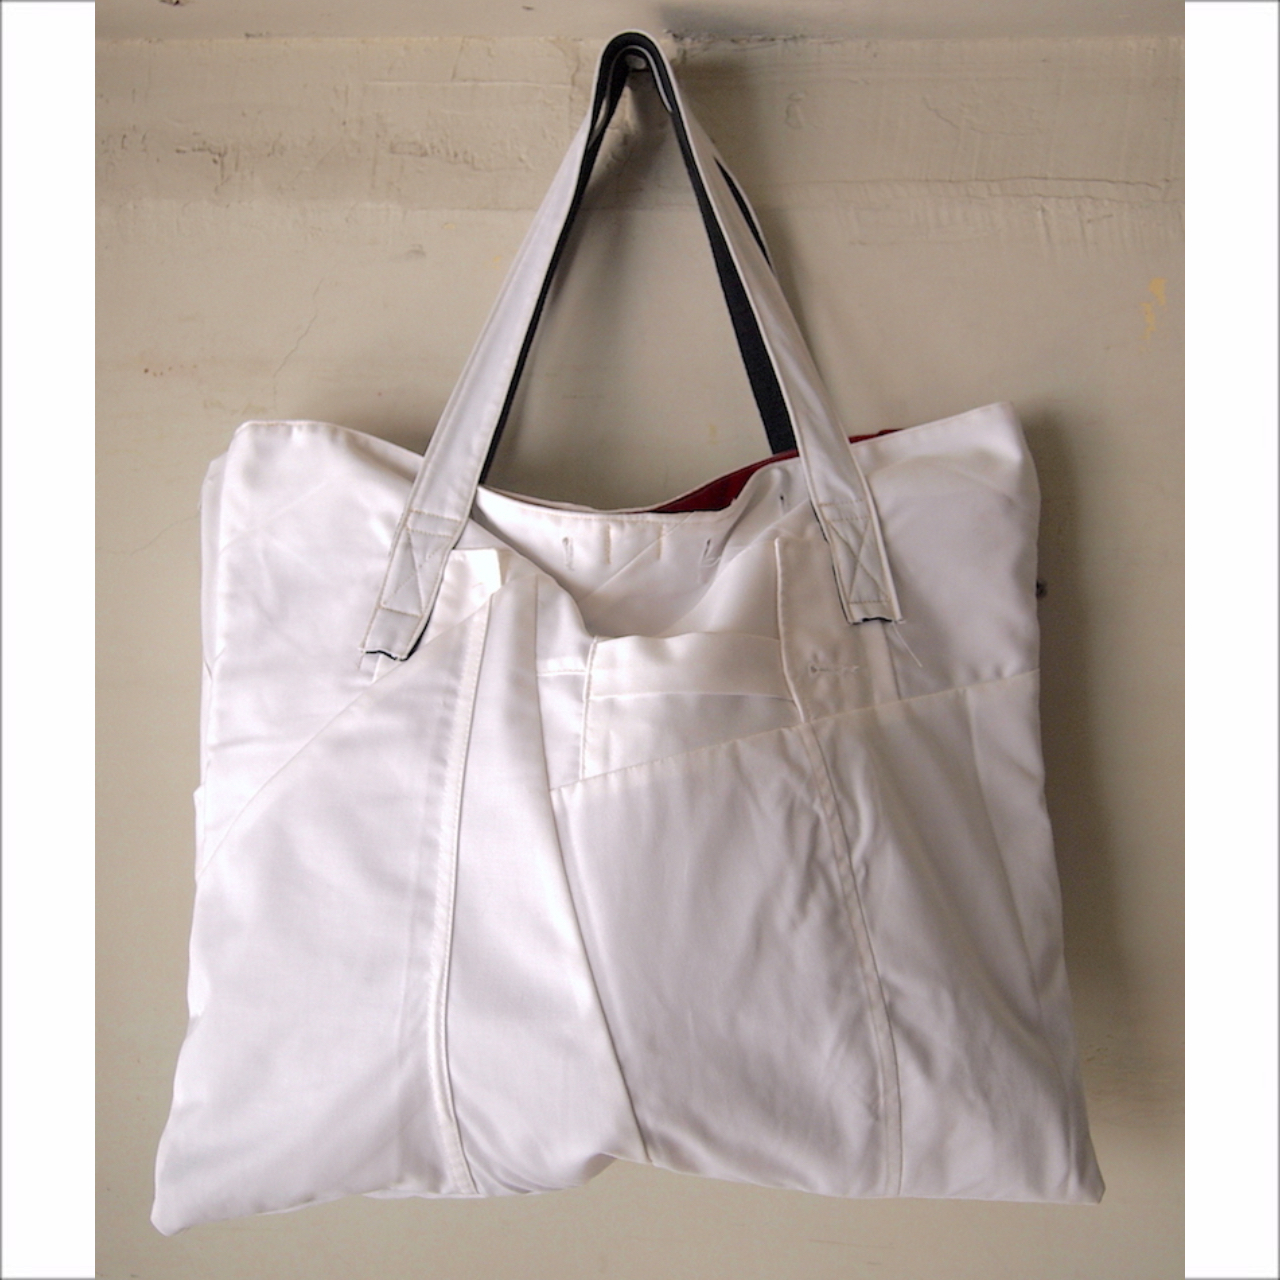 【sandglass】patchwork totebag / 【サンドグラス】パッチワーク トートバッグ